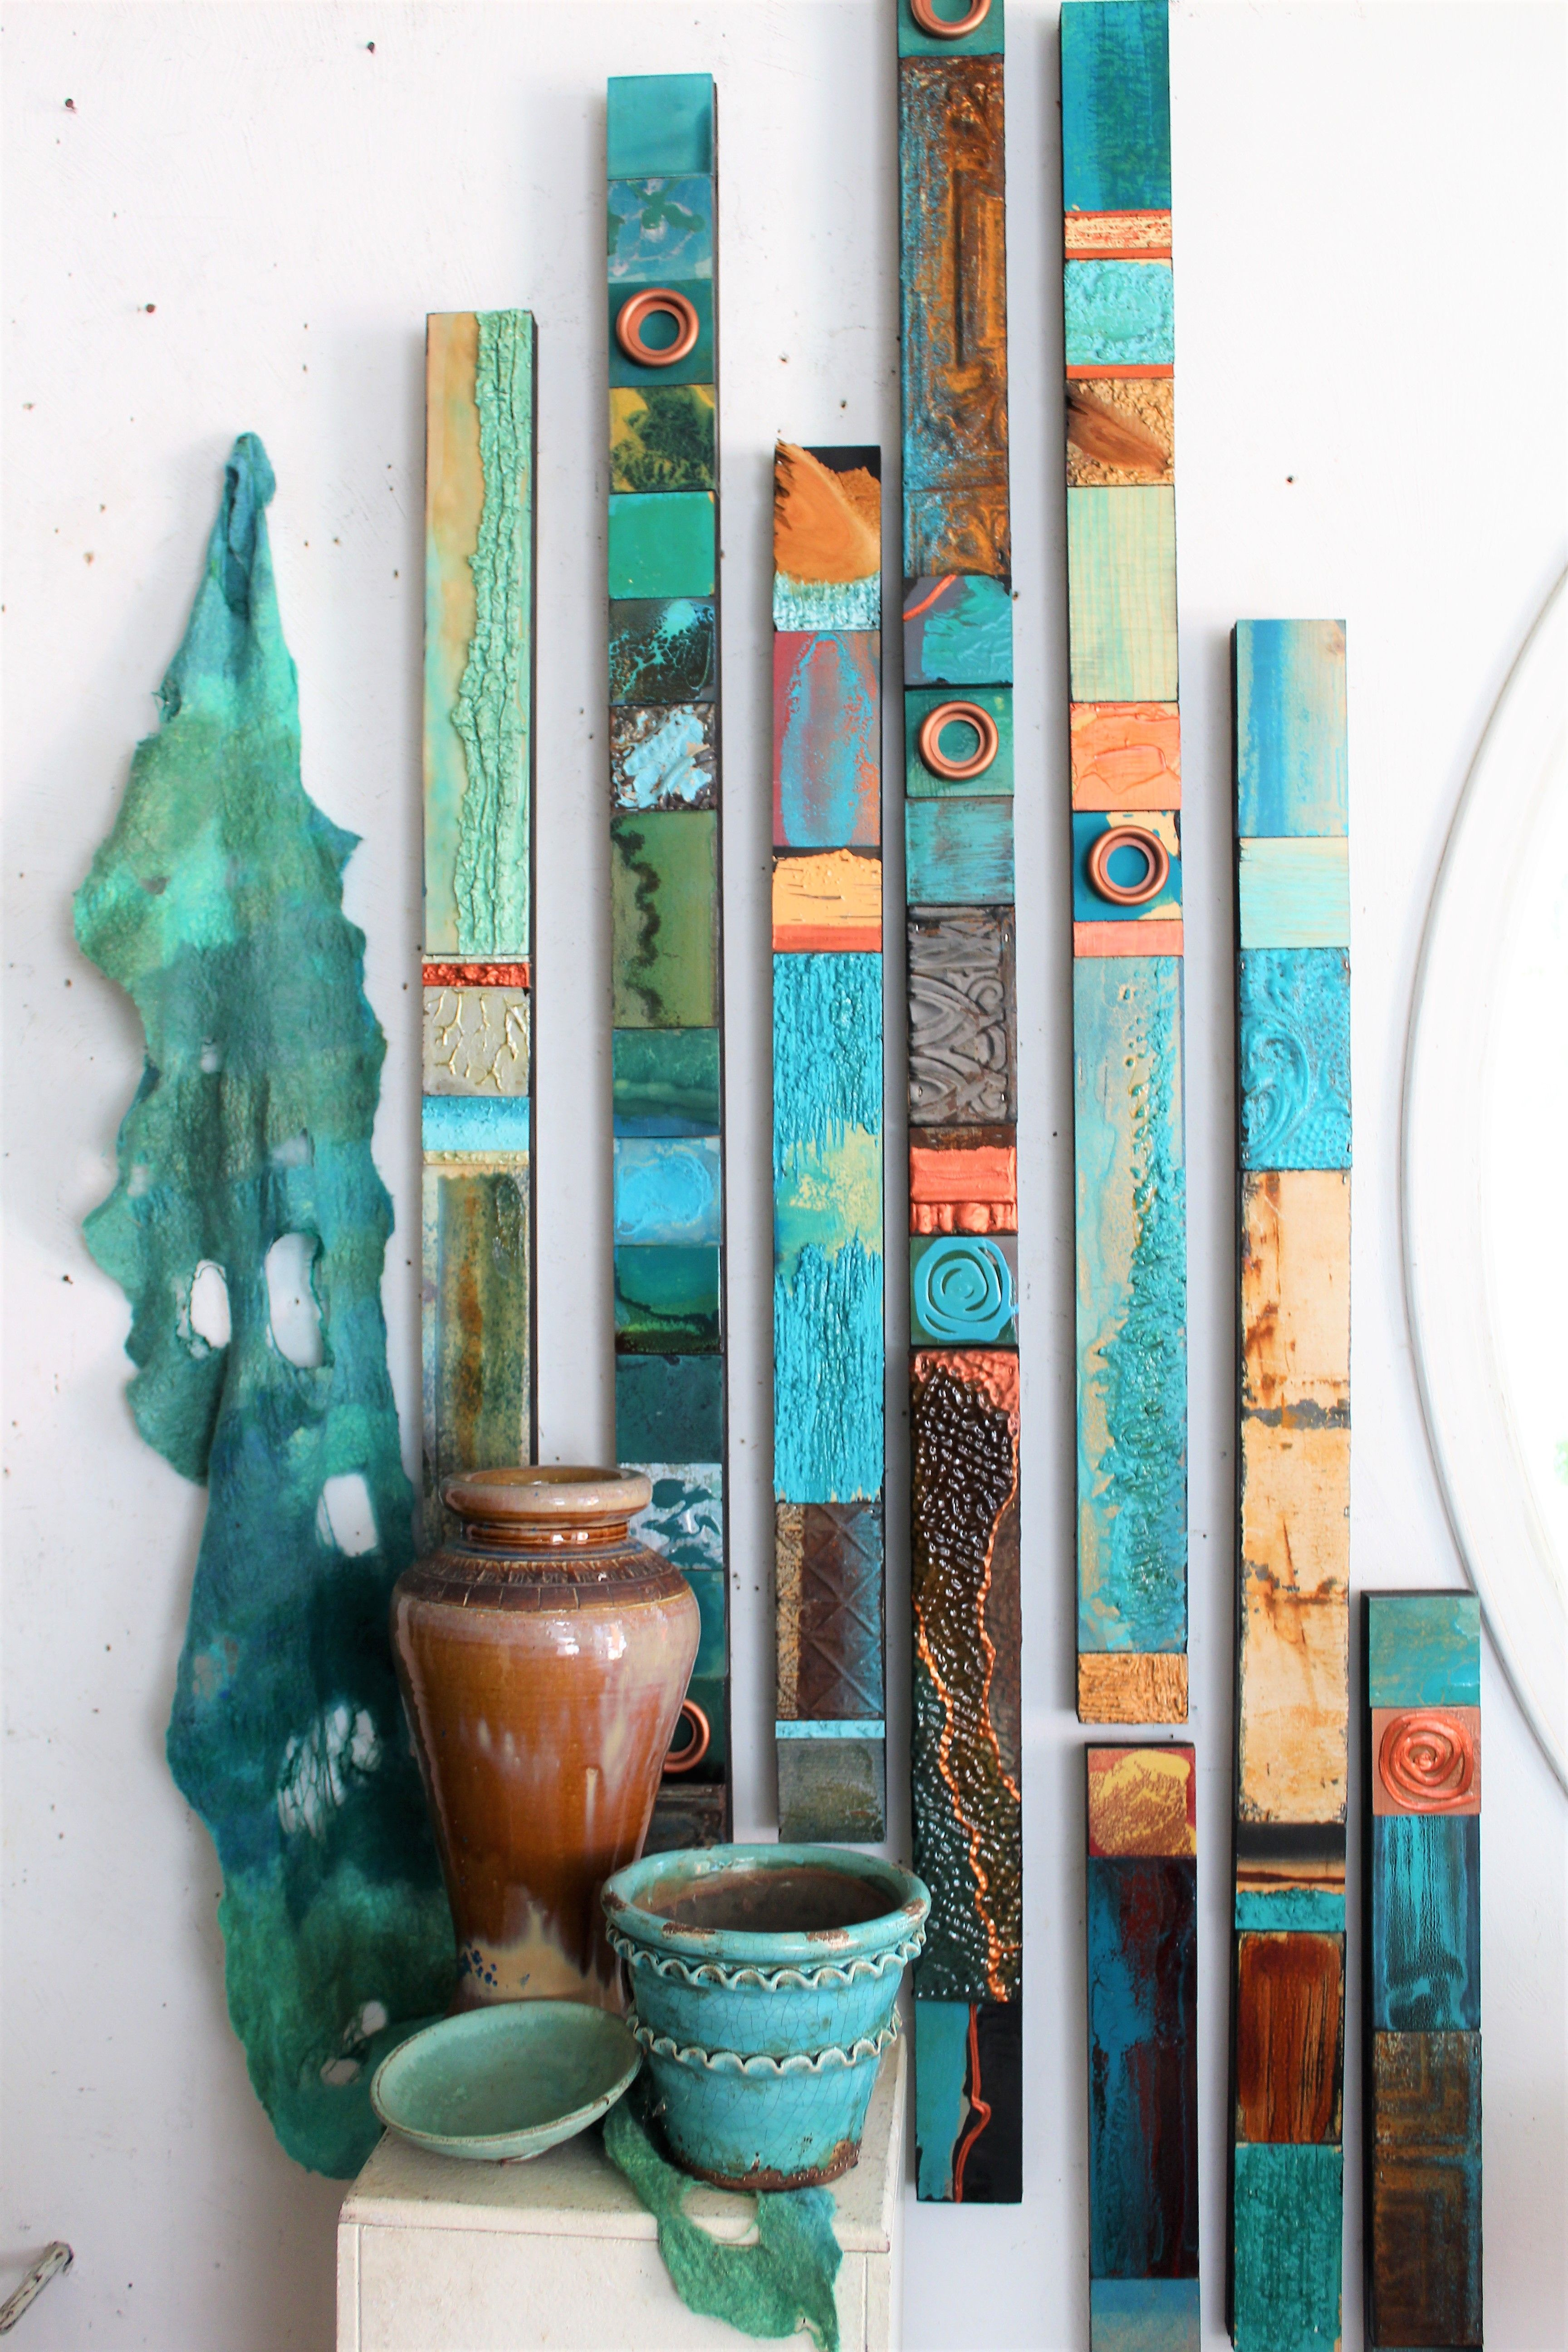 Wooden slats from benches art inspirations pinterest bench